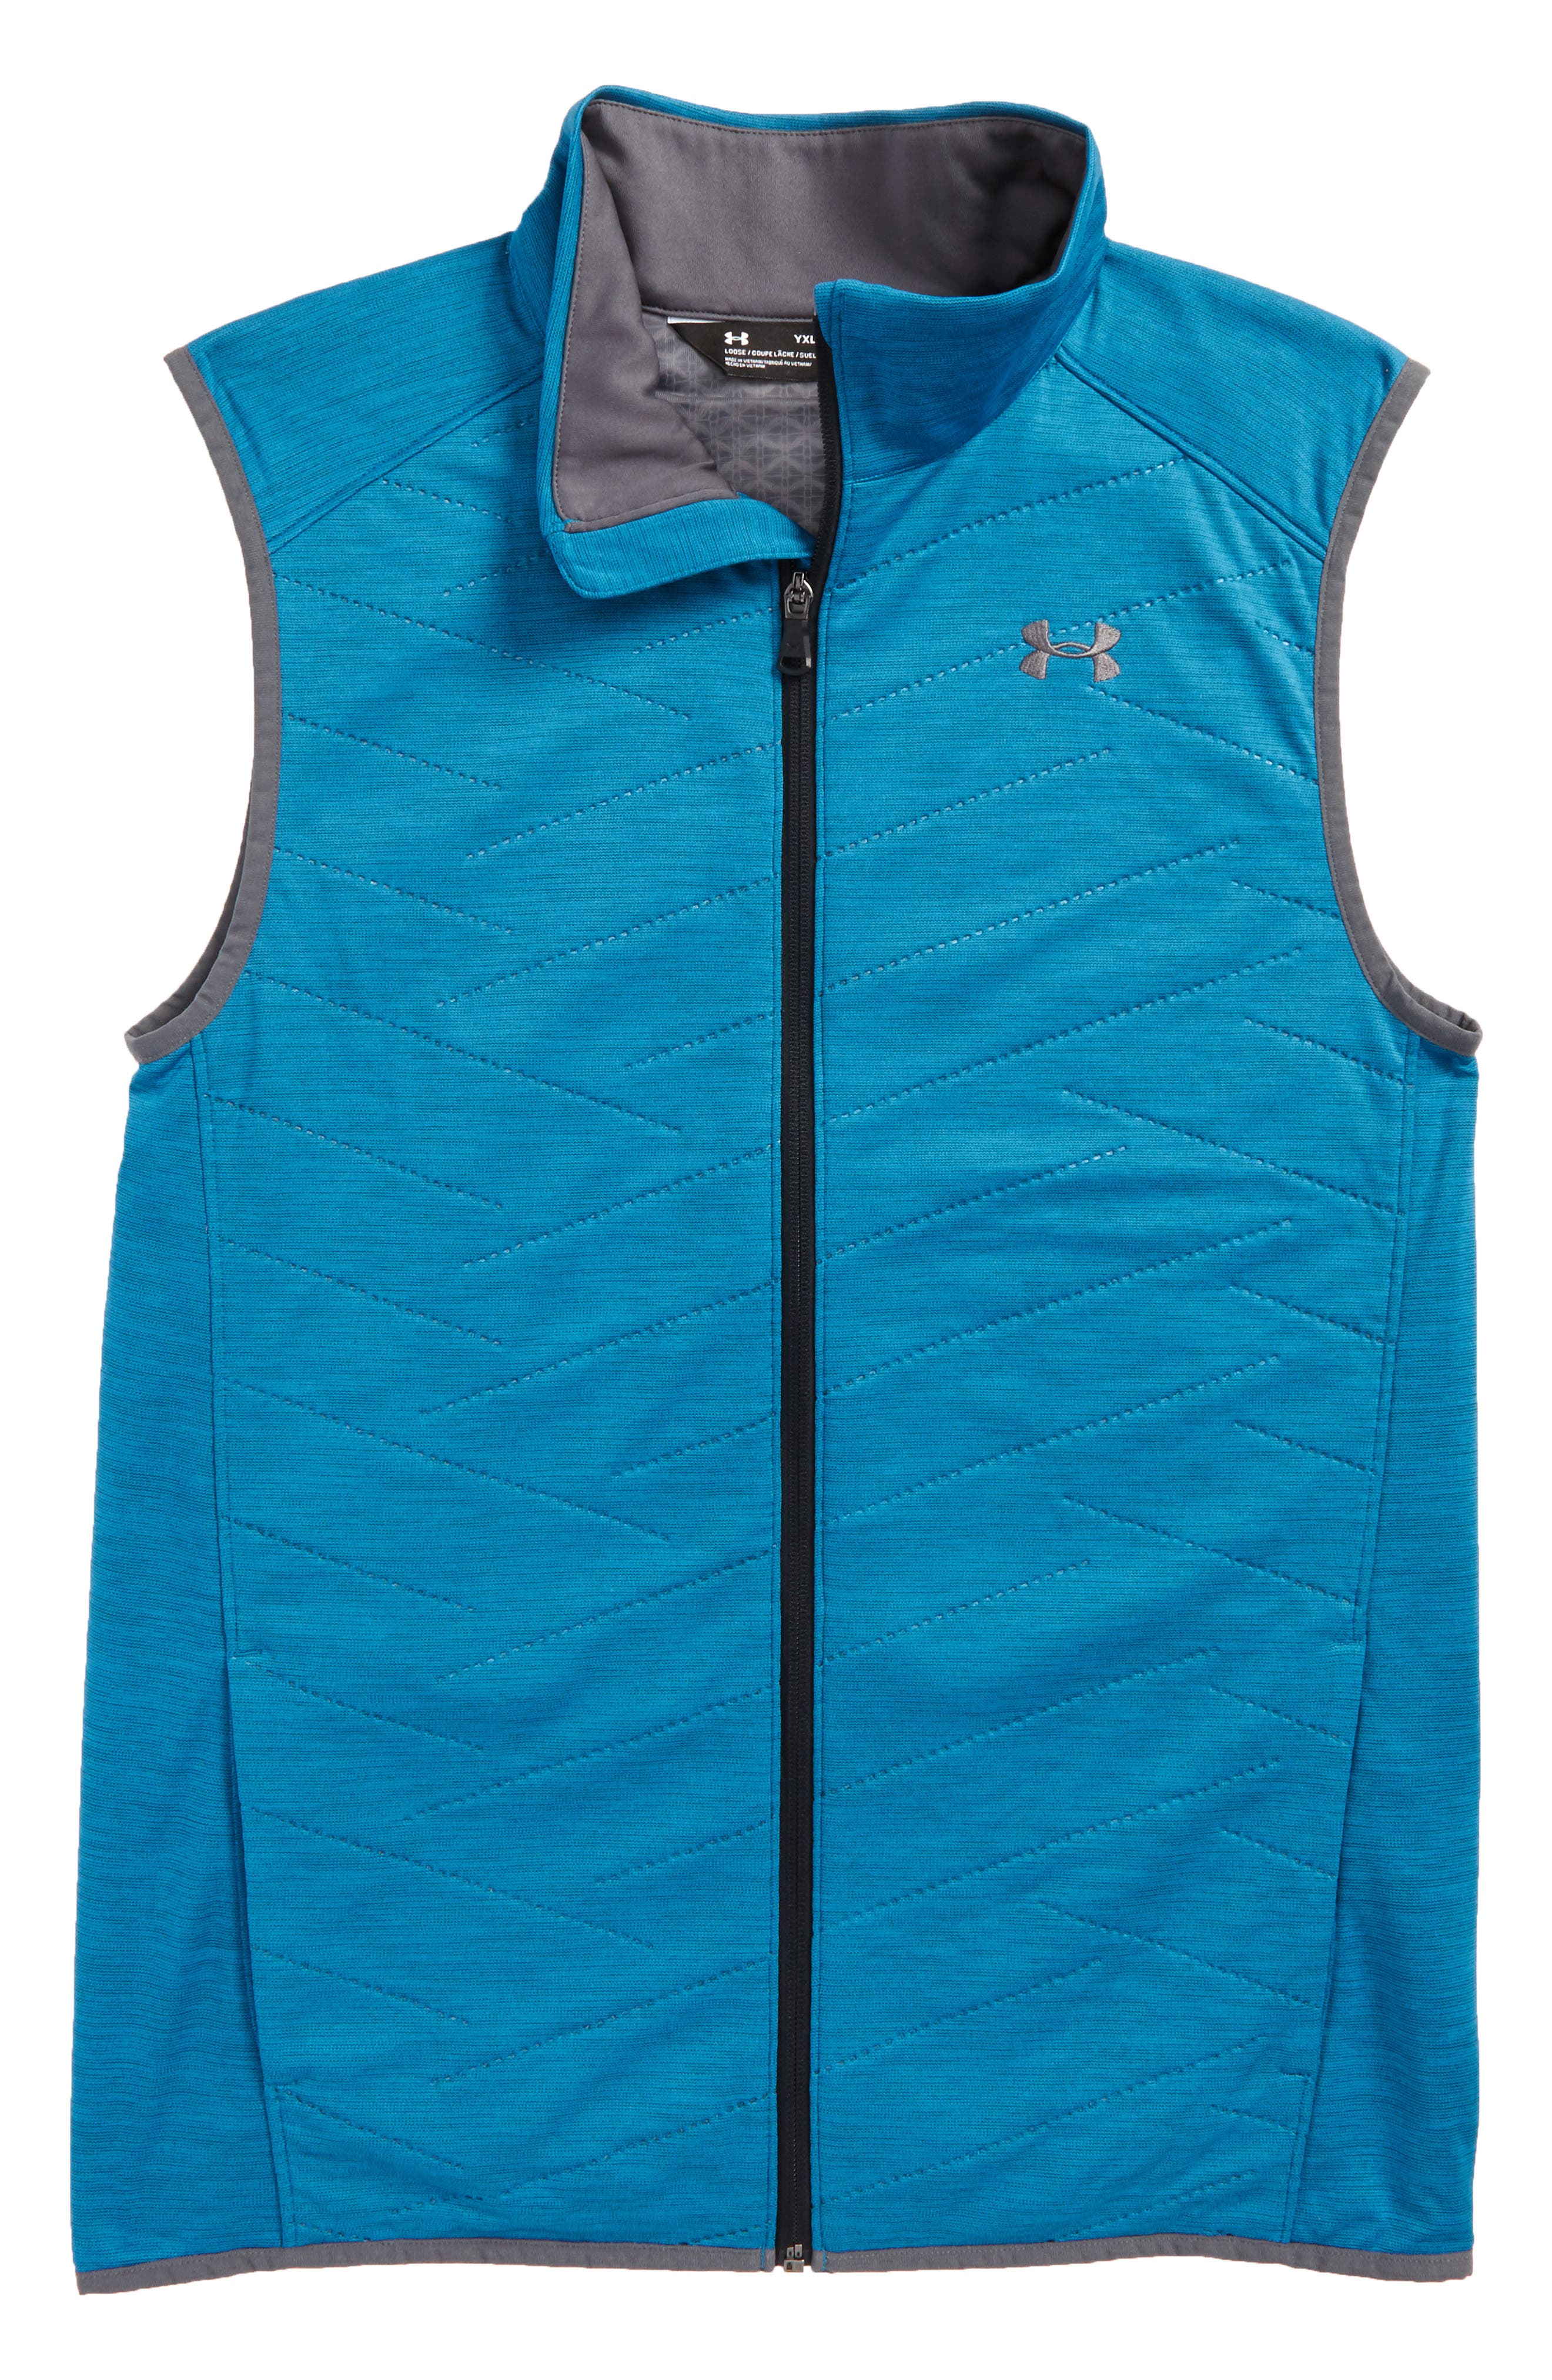 ColdGear<sup>®</sup> Reactor Hybrid Vest,                             Main thumbnail 1, color,                             Bayou Blue/ Rhino Gray